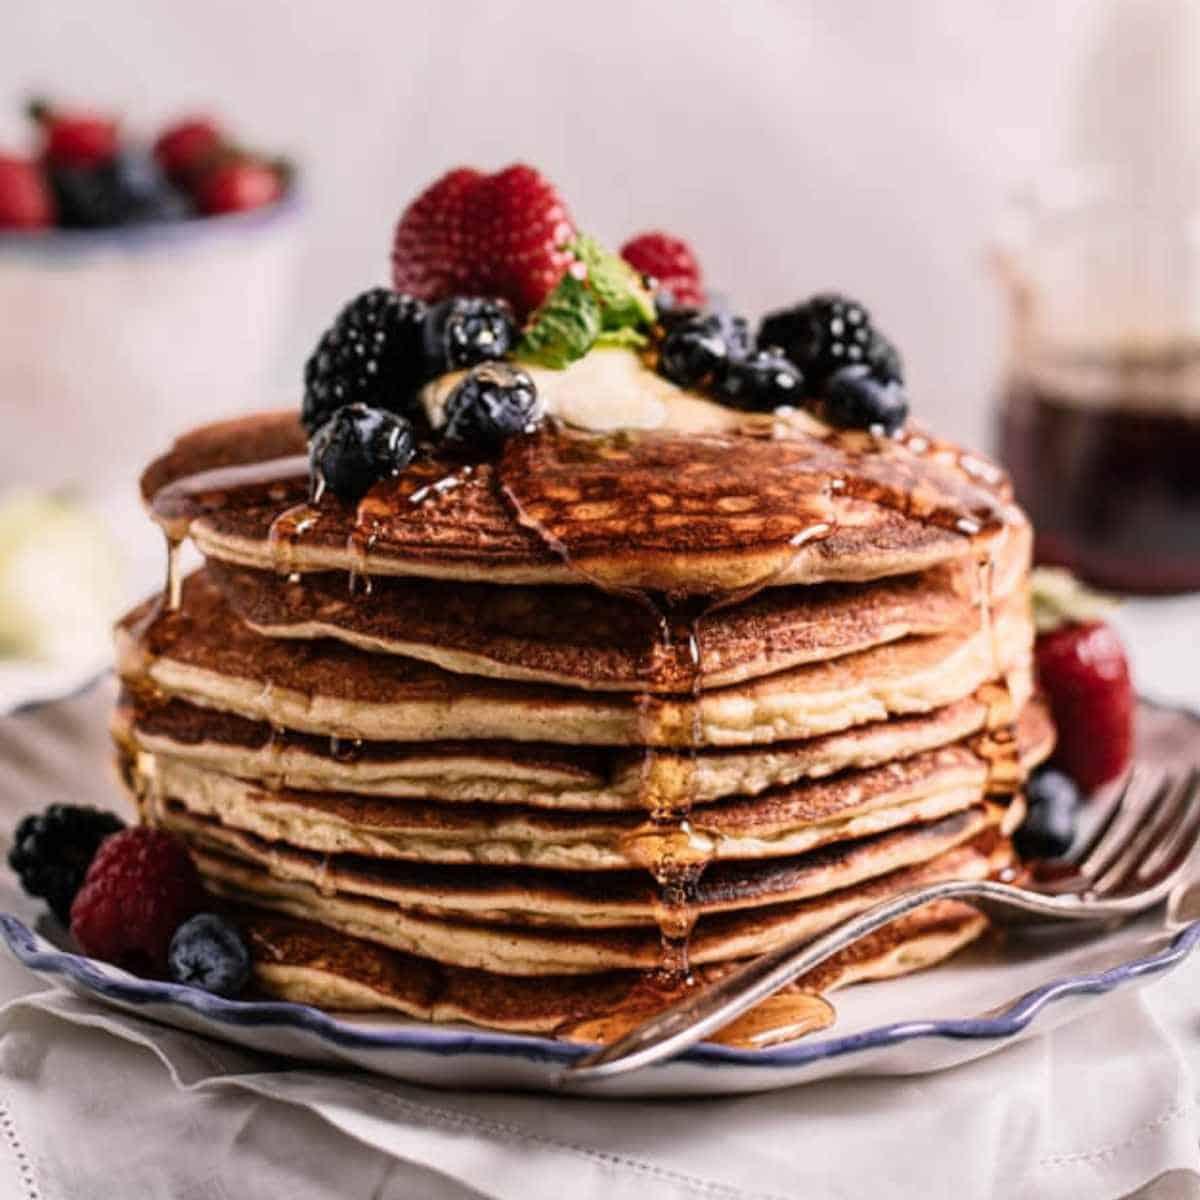 keto pancakes - Keto Coconut Flour Recipes: Desserts to Dinners